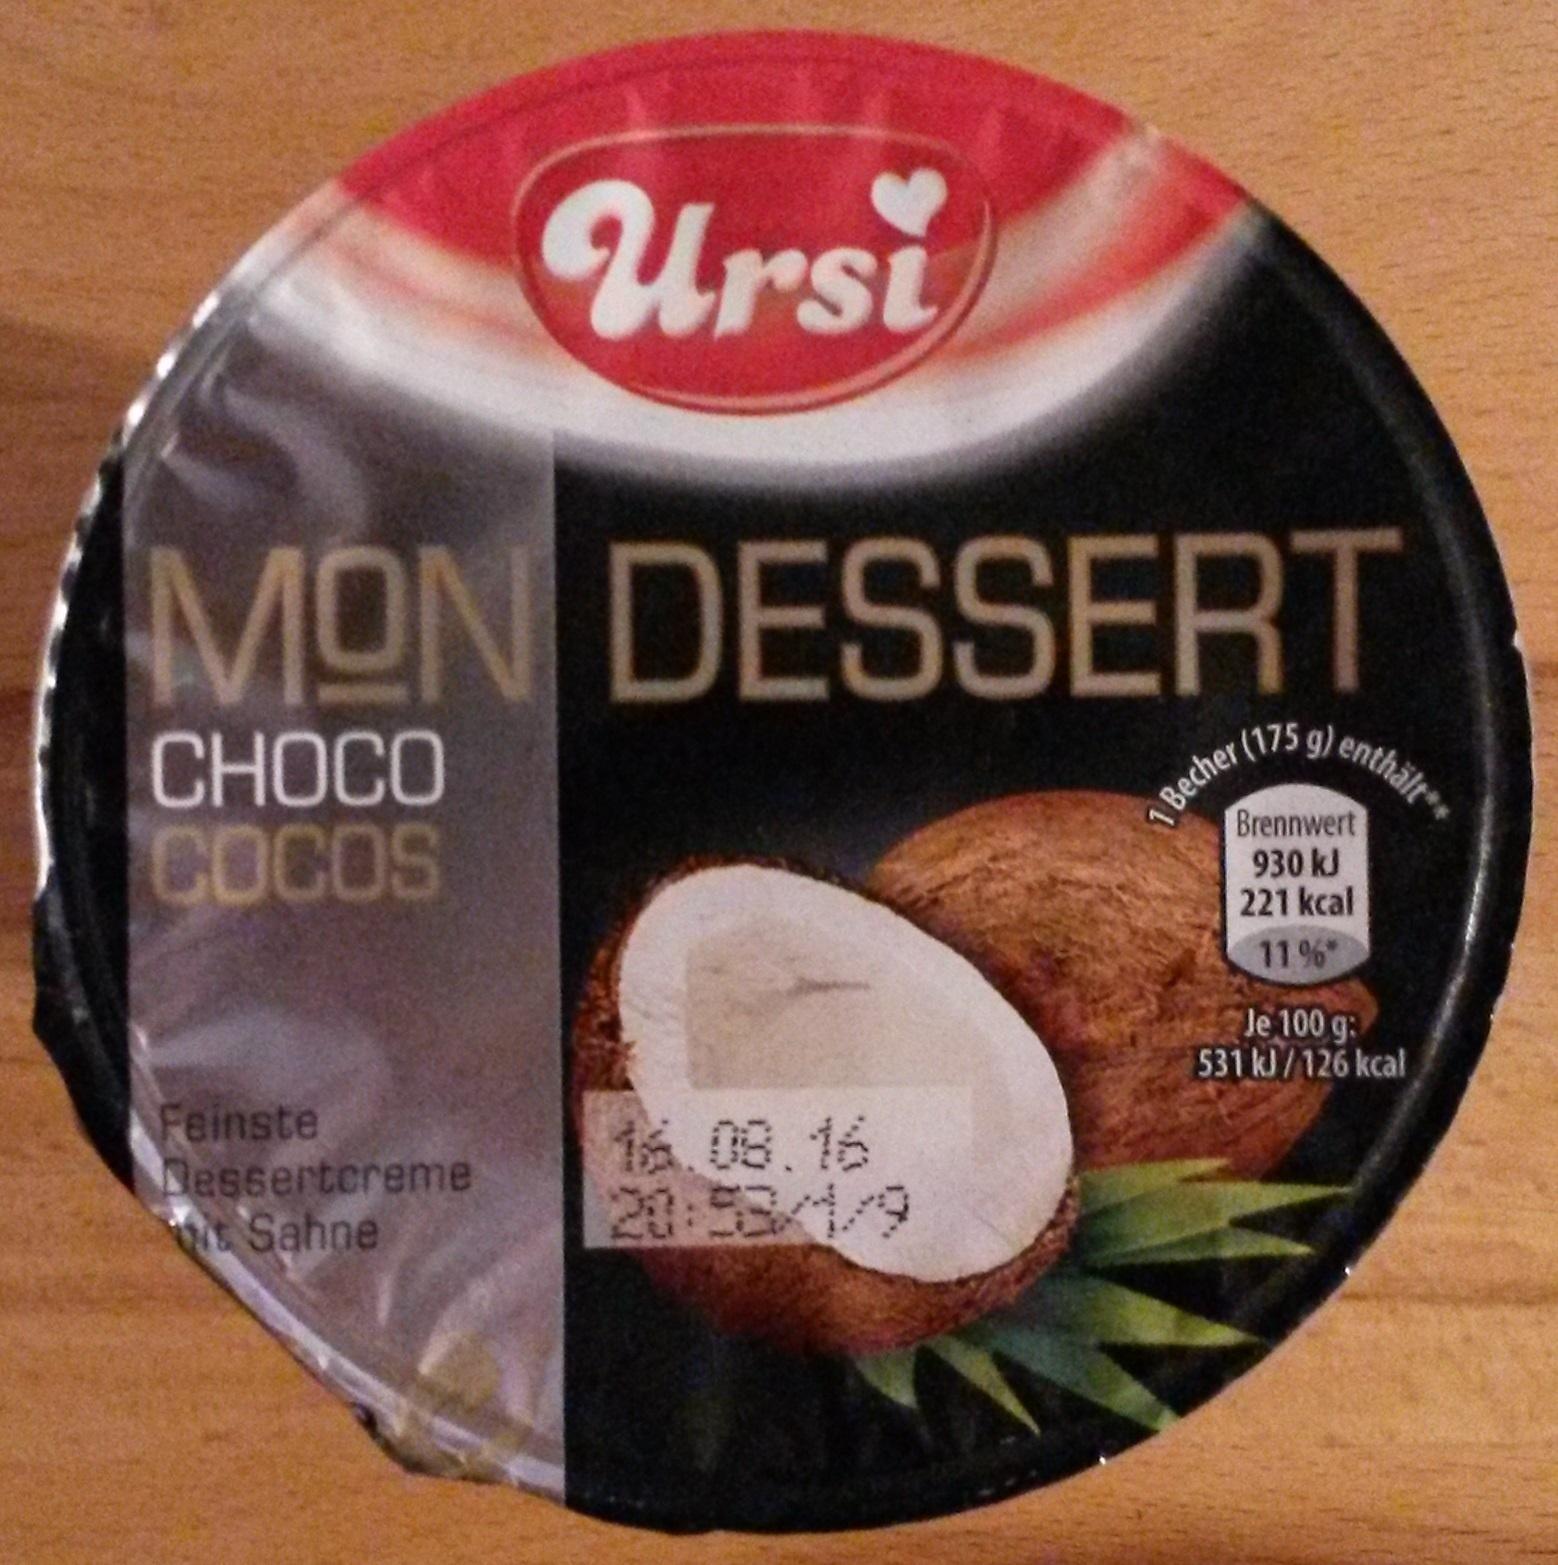 Mon Dessert Choco Cocos - Product